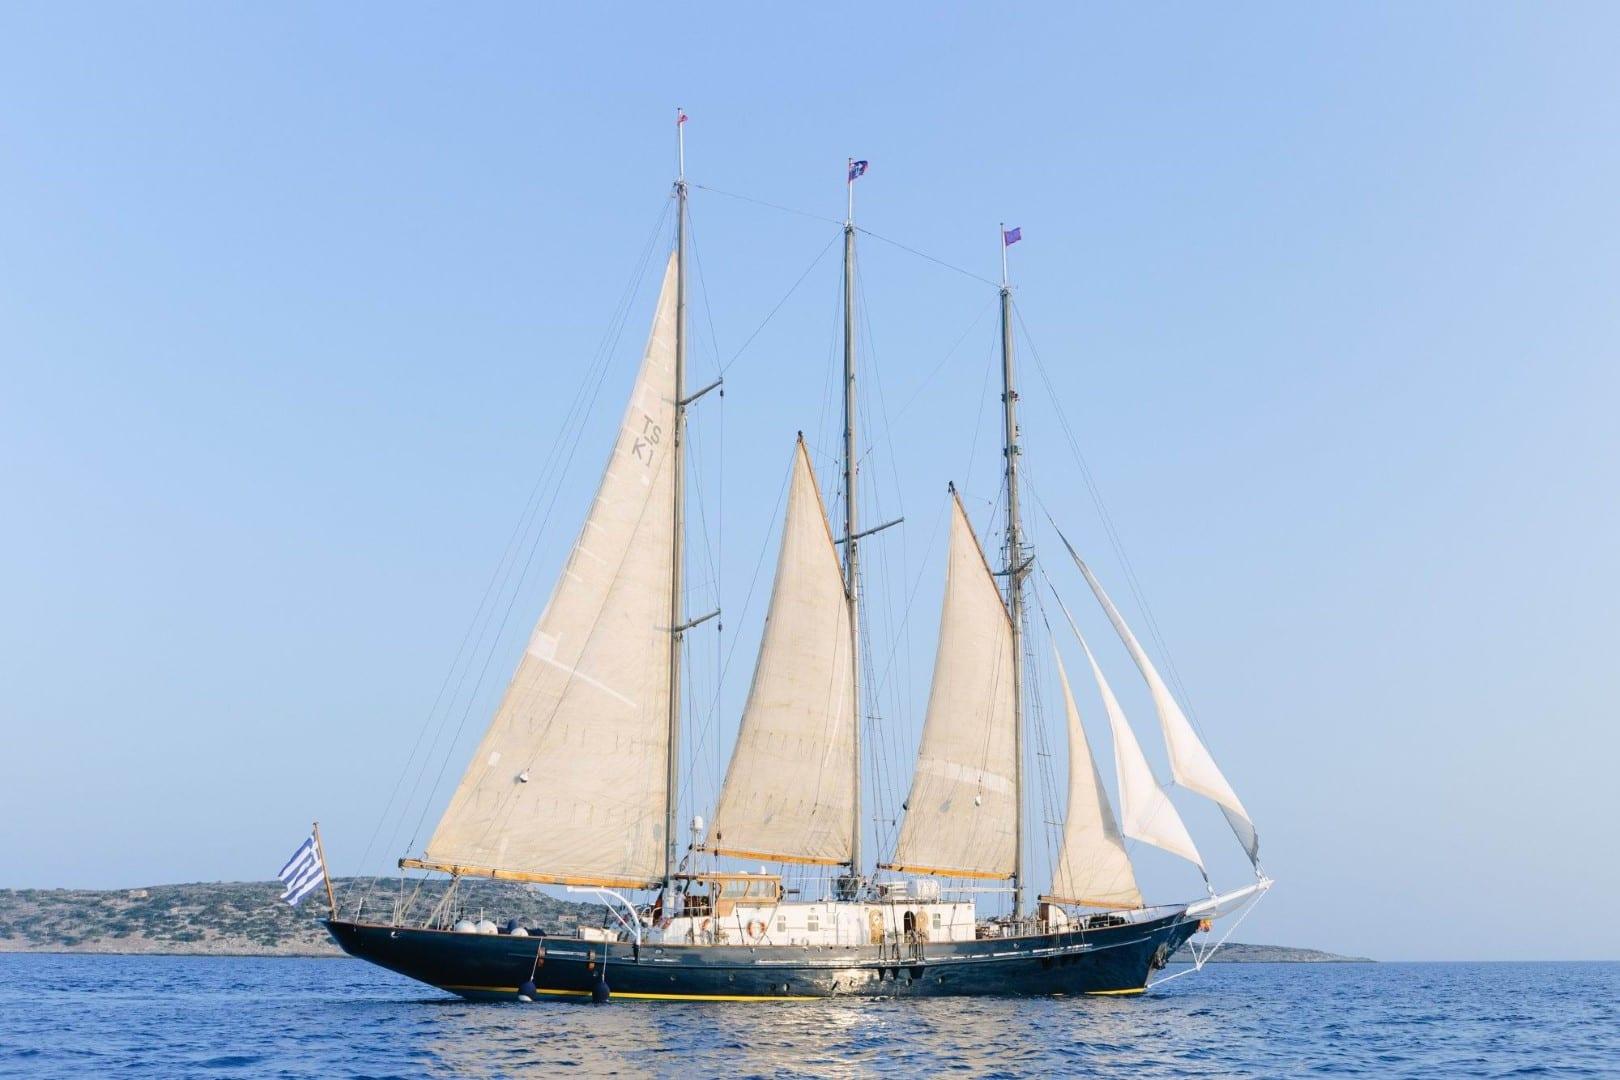 sir winston churchill classic sailing yacht profile -  Valef Yachts Chartering - 2792